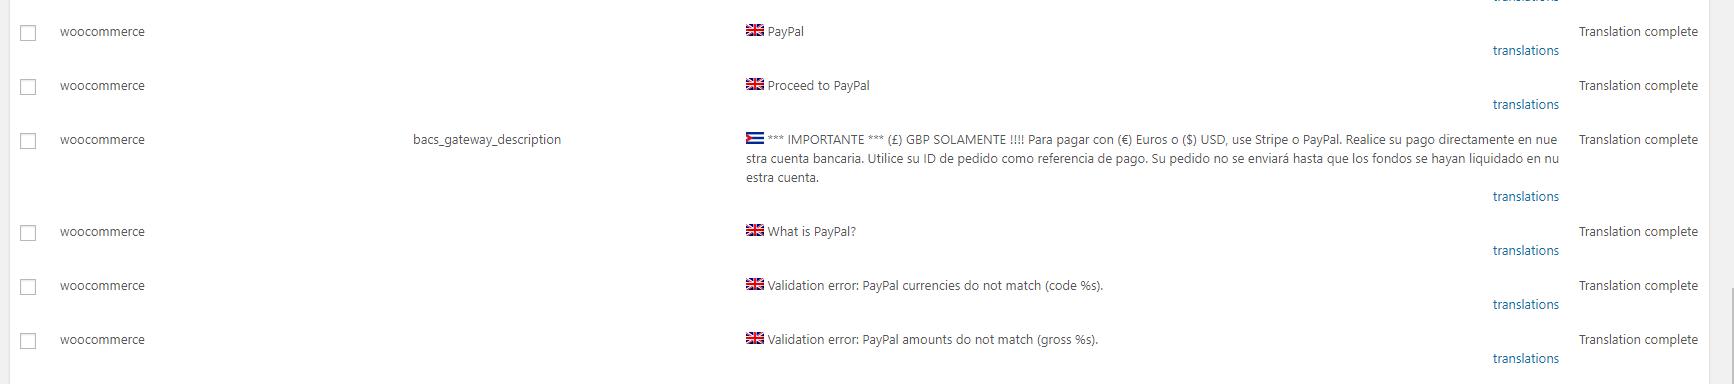 reverse translation.PNG